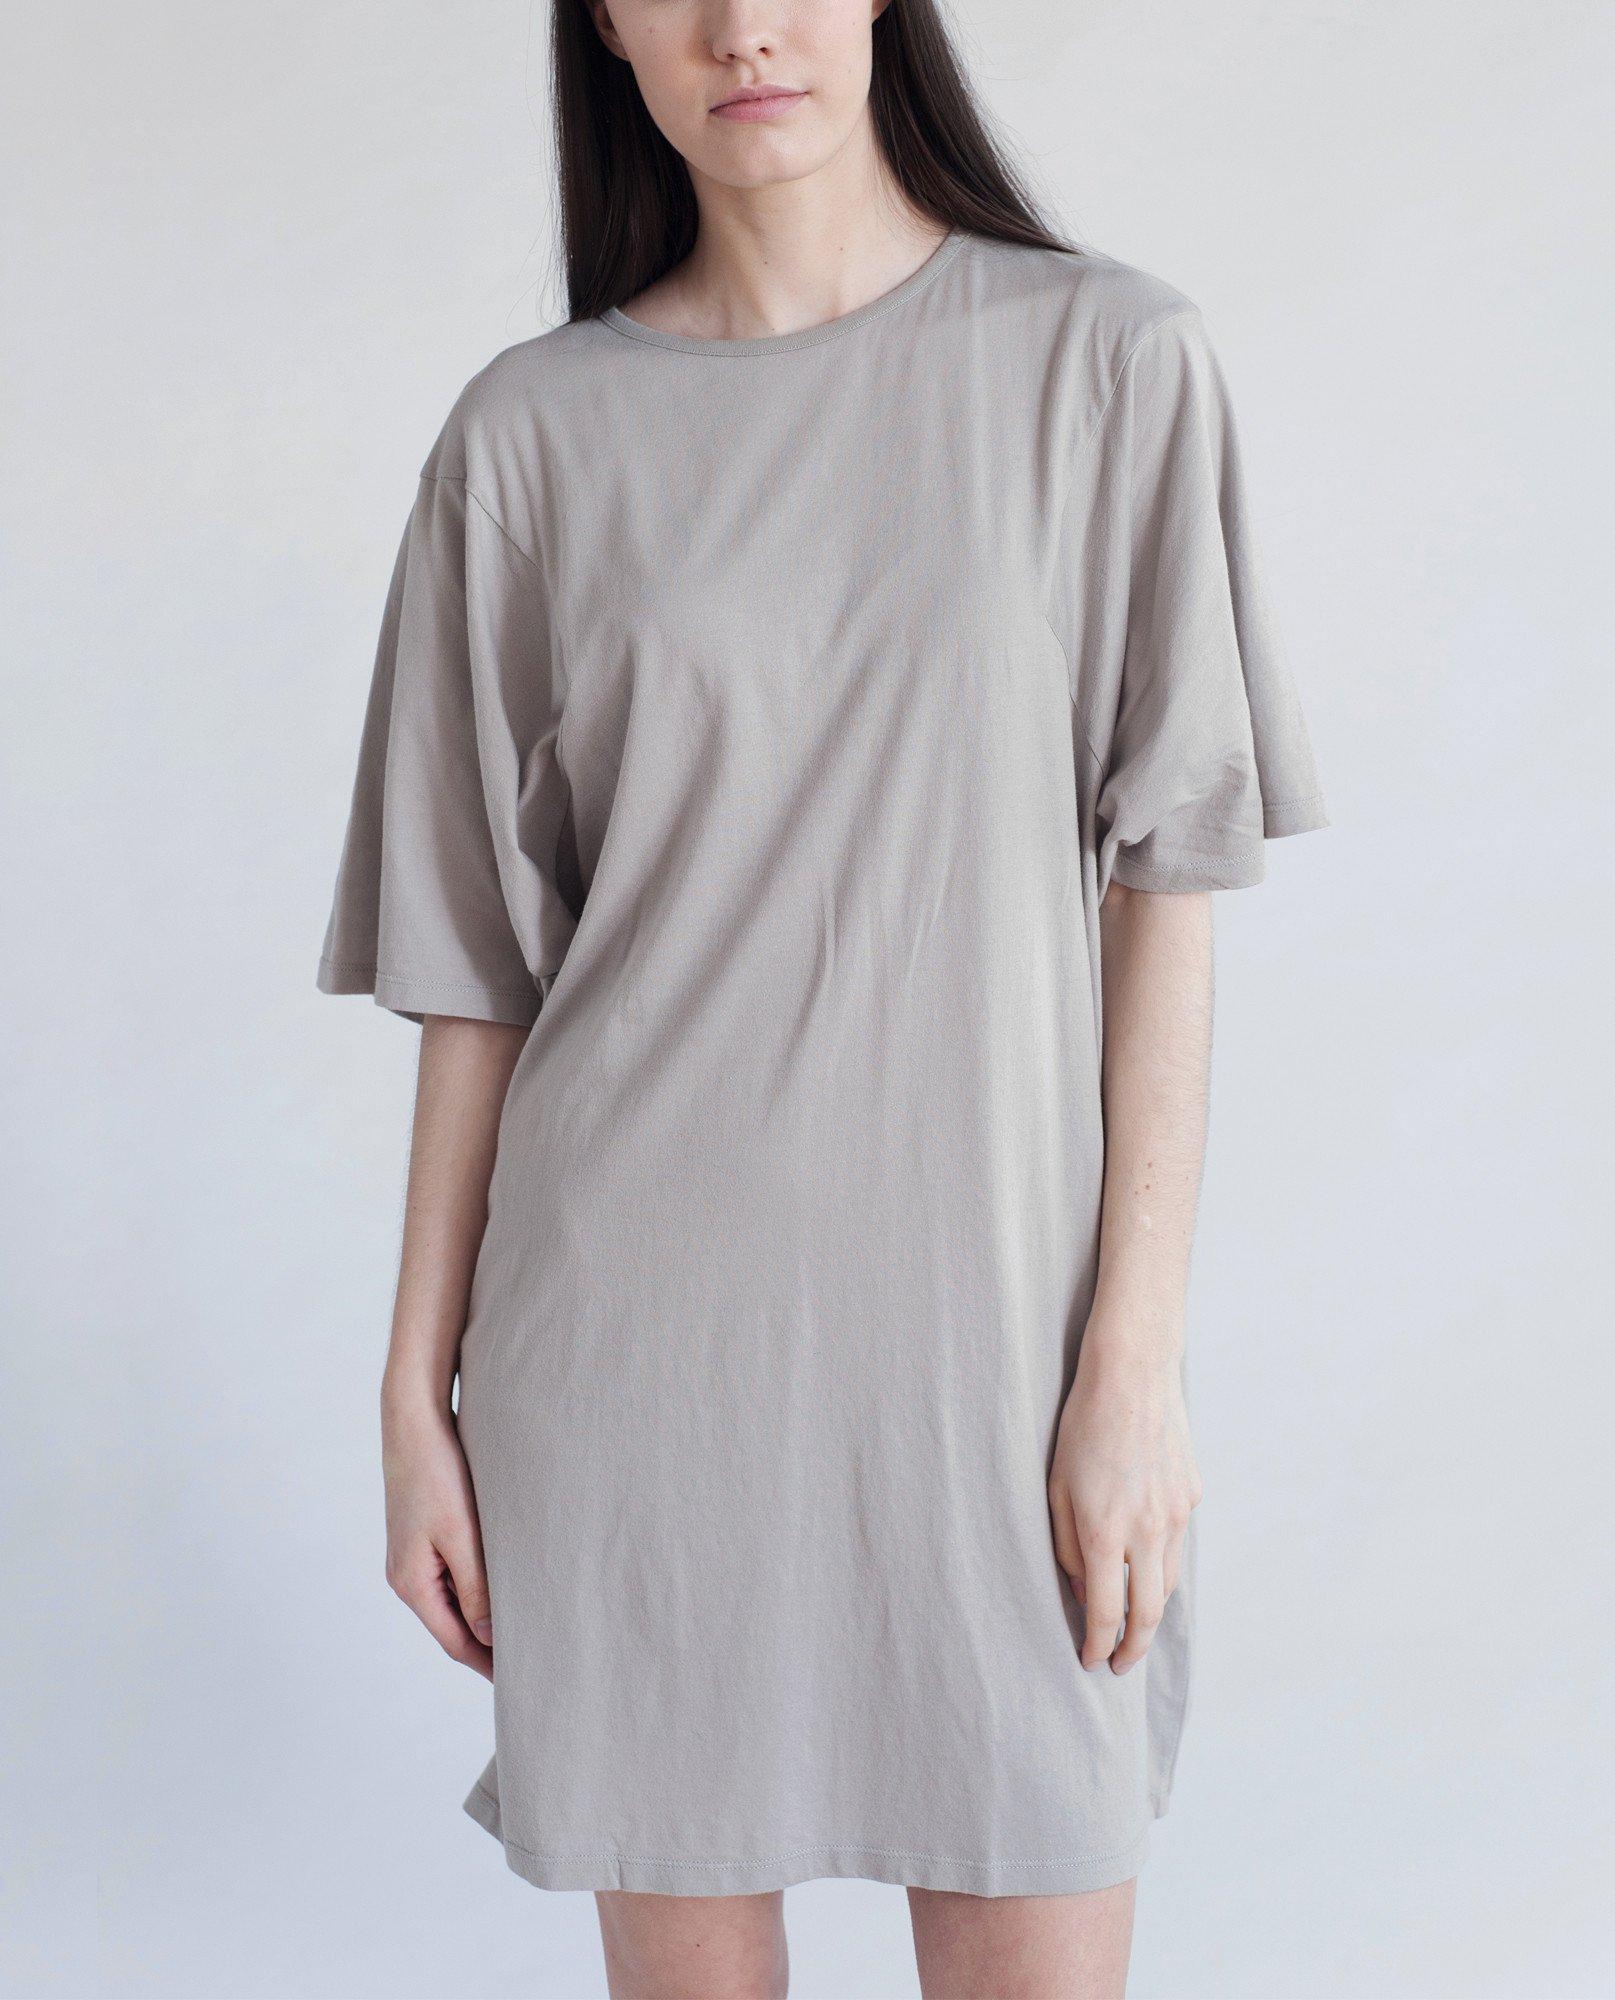 DAISY Organic Cotton Tshirt In Light Grey from Beaumont Organic